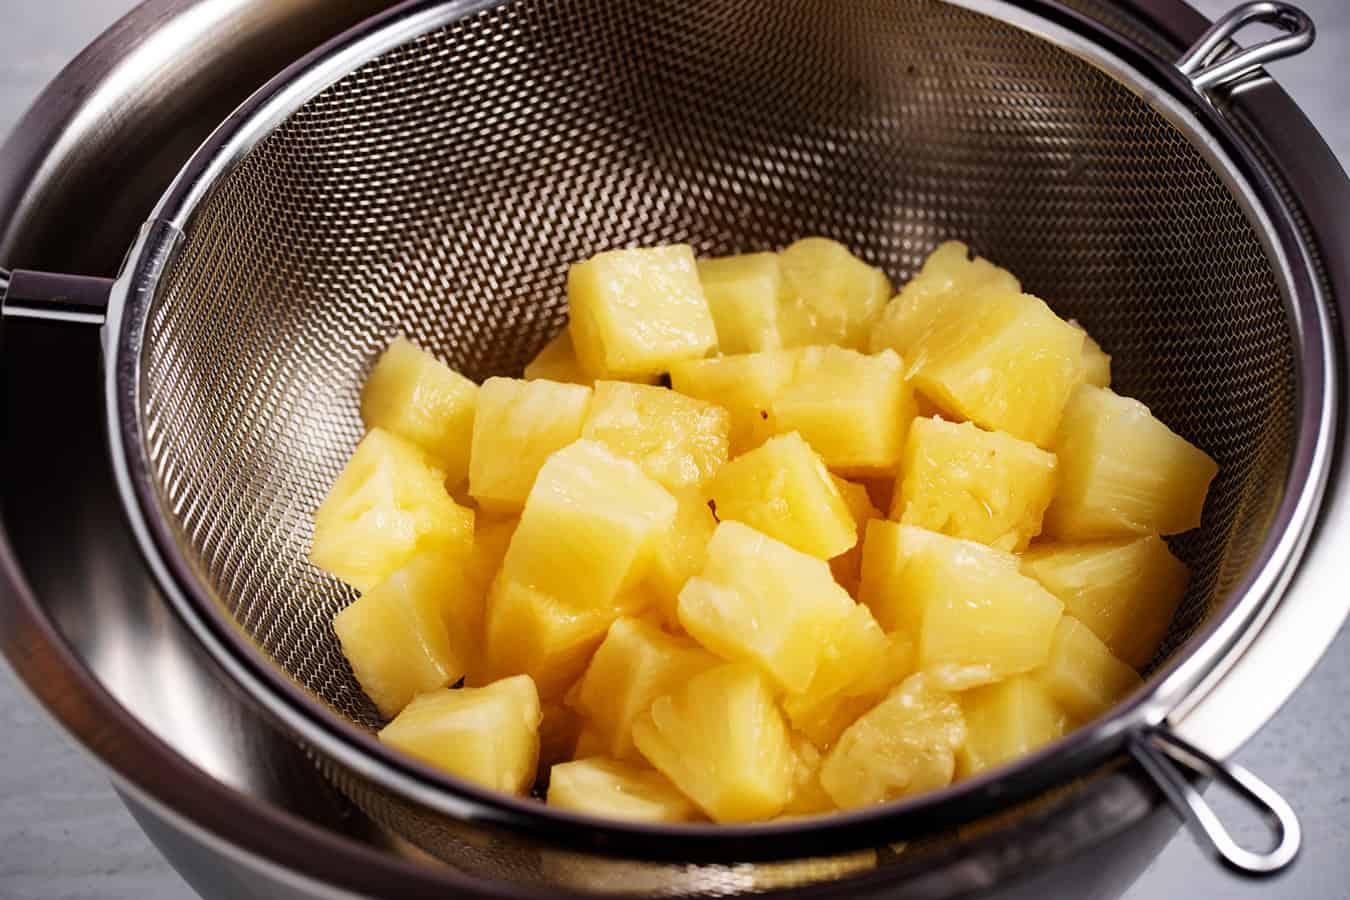 pineapple draining in colander